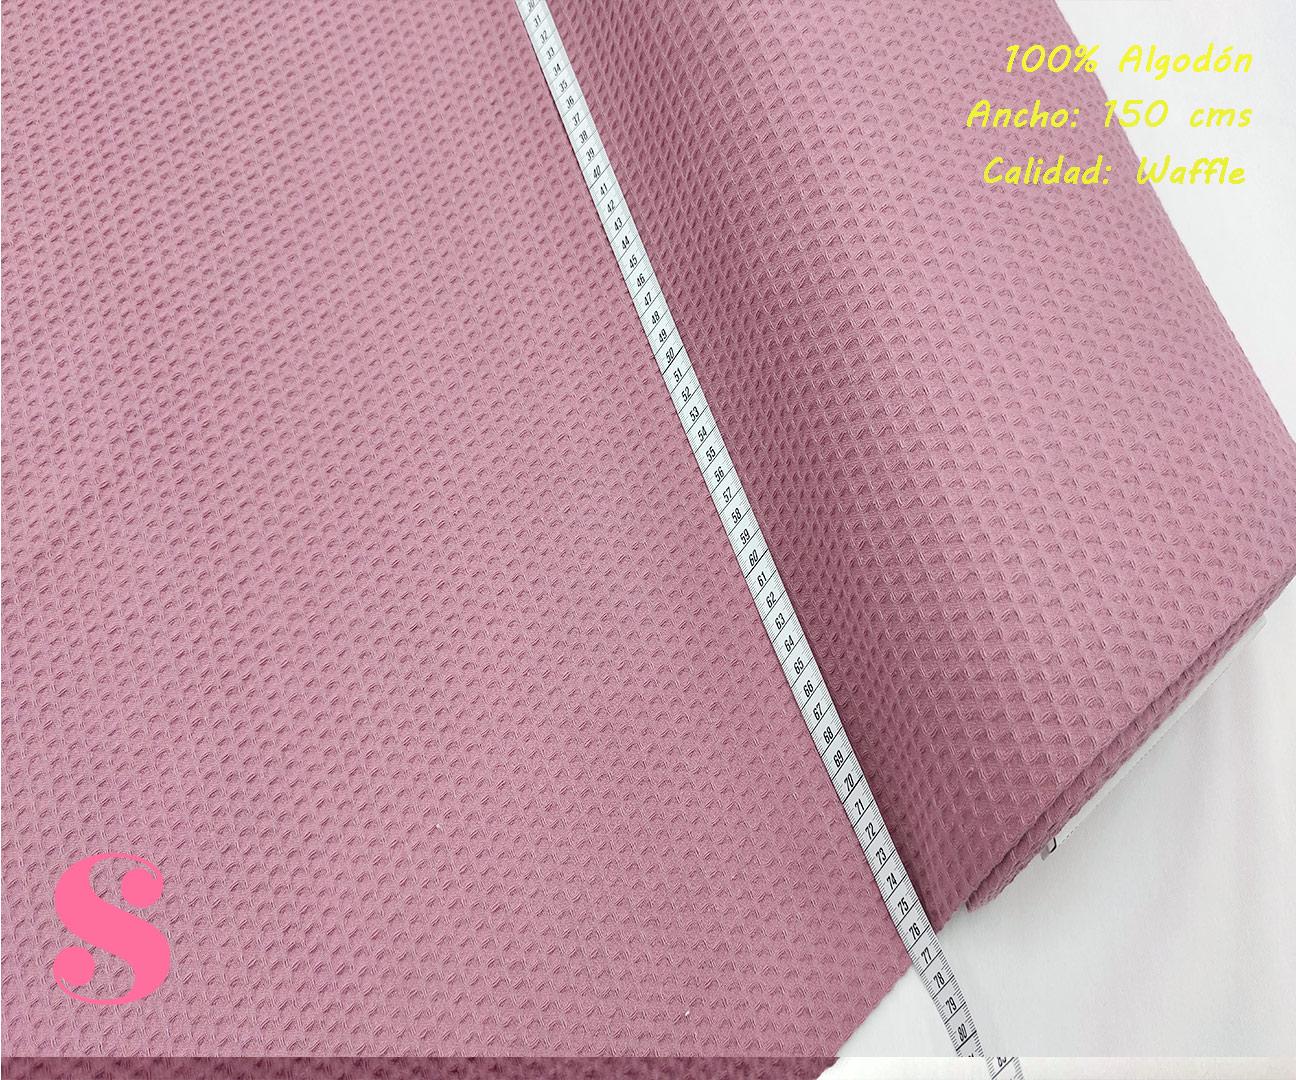 W5-waffle-tela-invierno-toalla-relieve-cuadros-gofre-algodon,Wafel Cuadrados Rosa